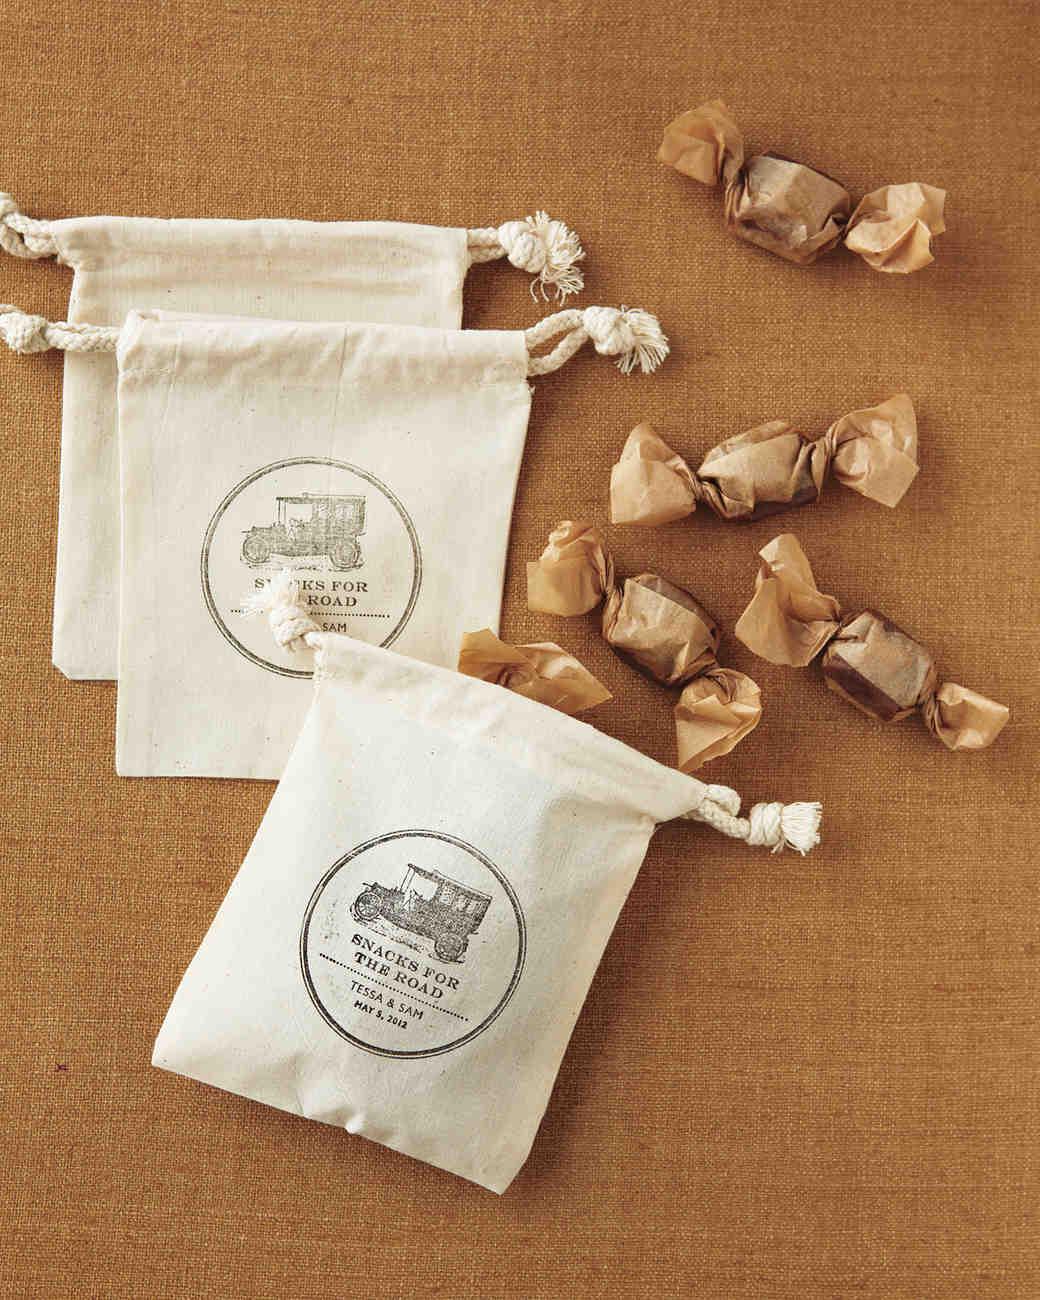 clip-art-small-bags-mwd107615.jpg